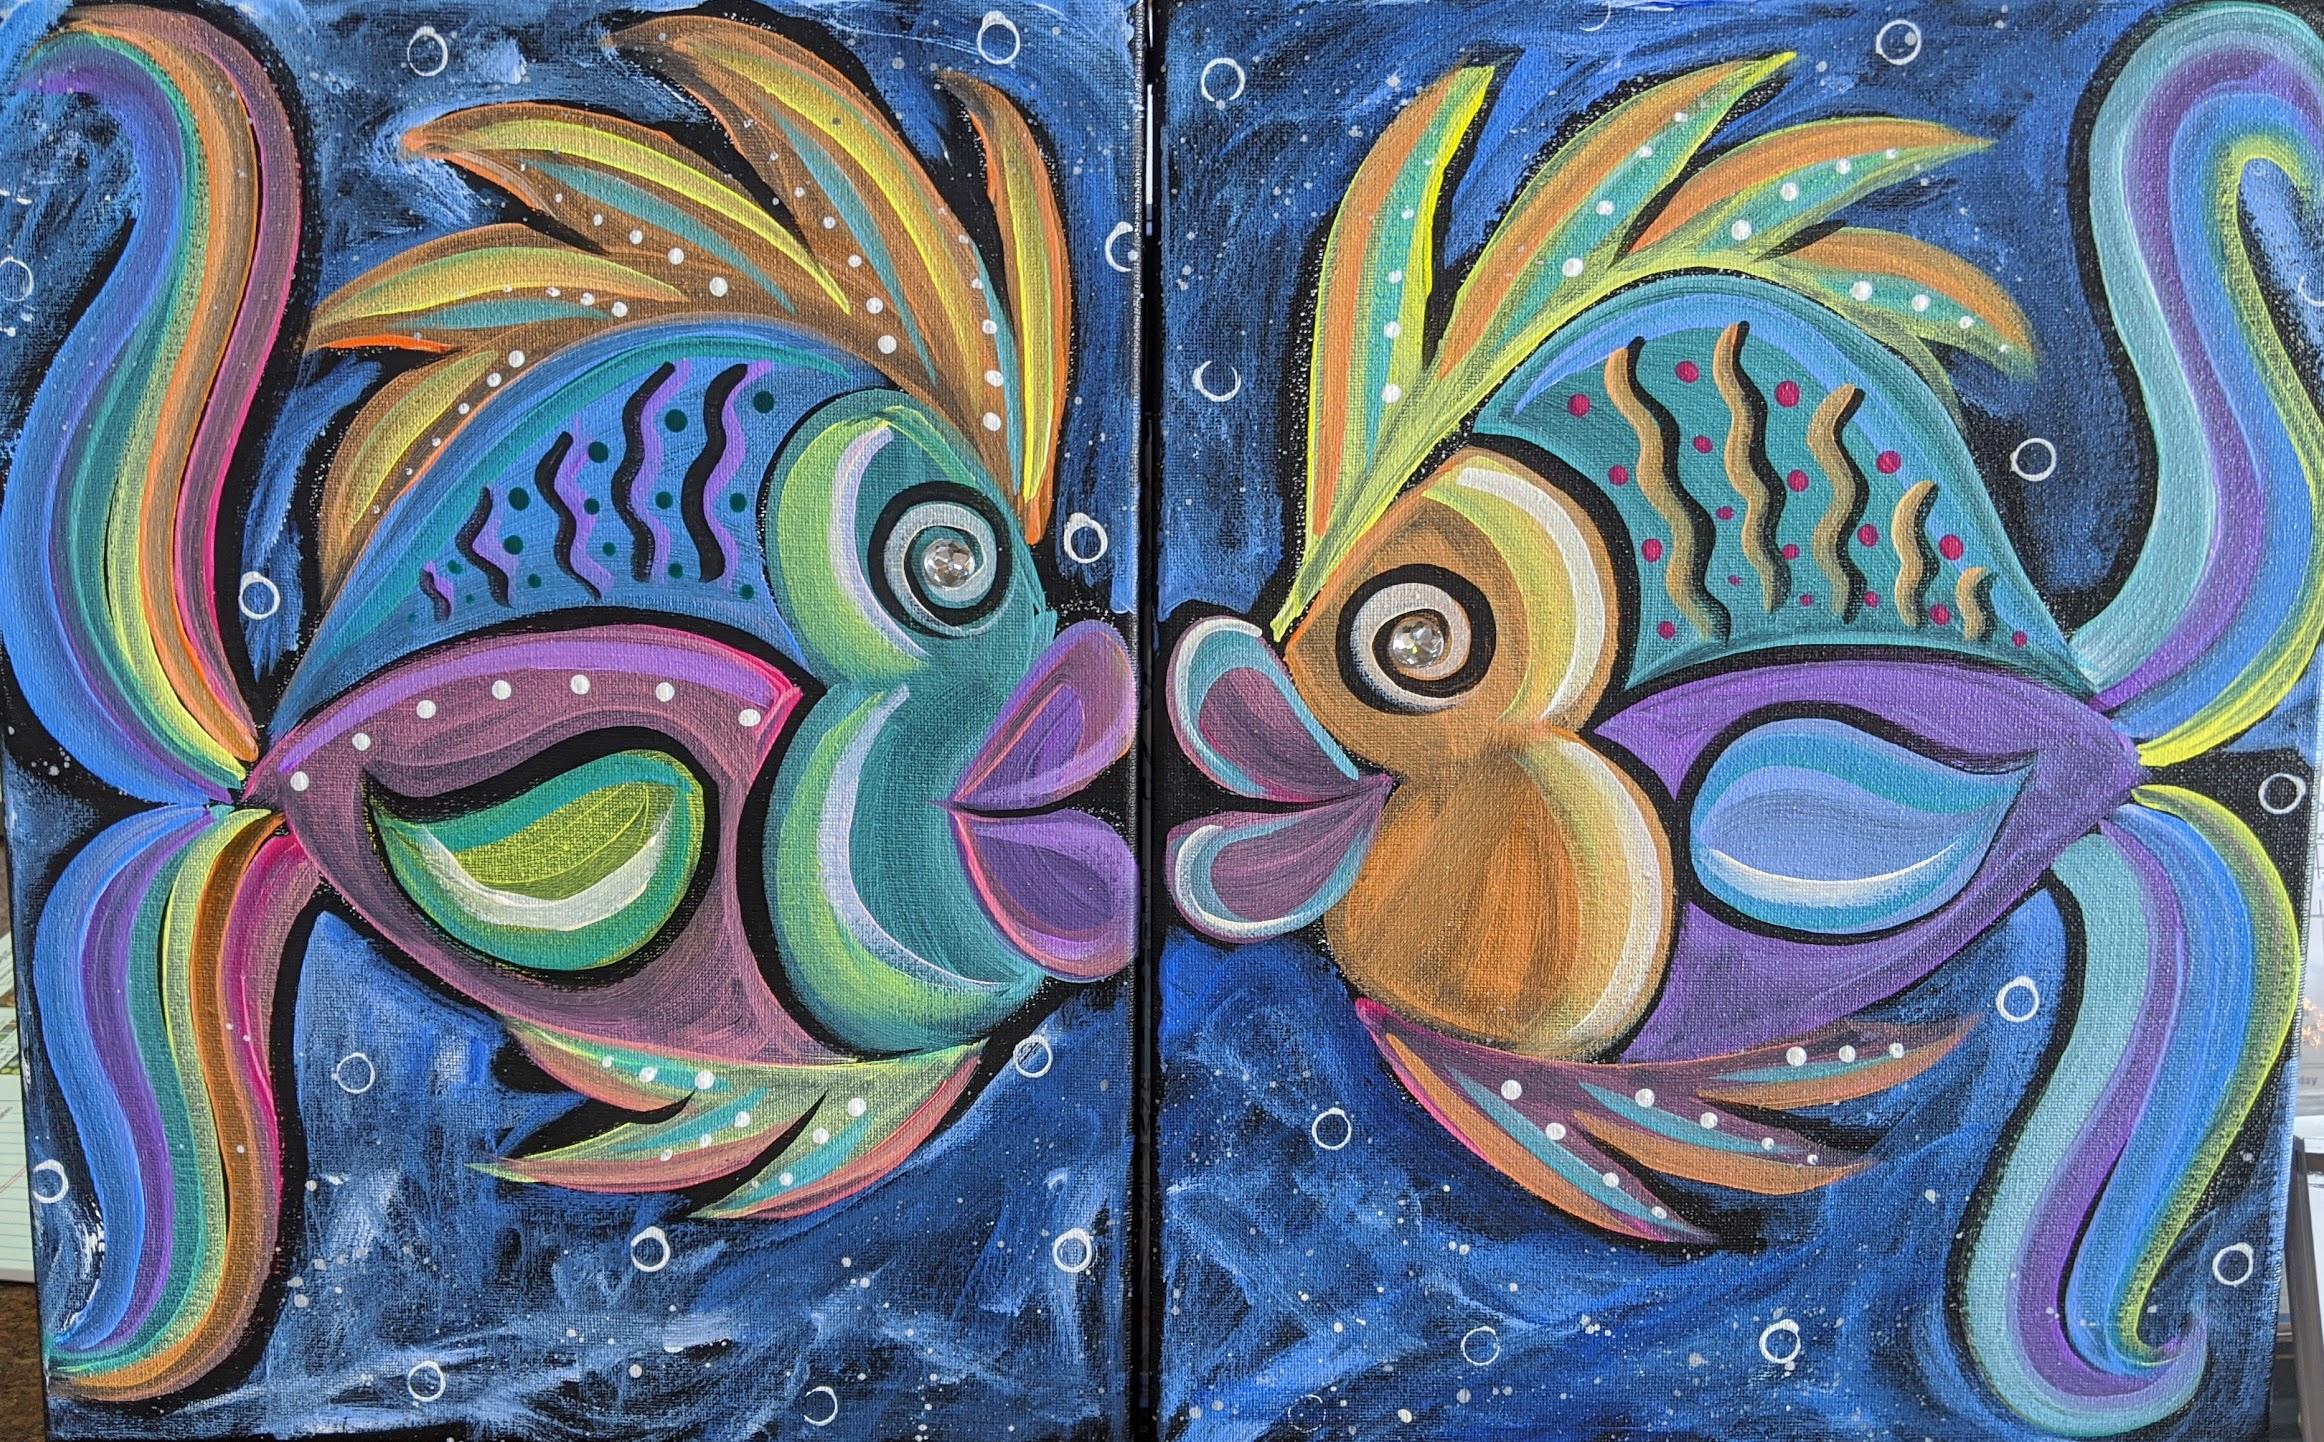 Couple's Kaleidoscope Fish